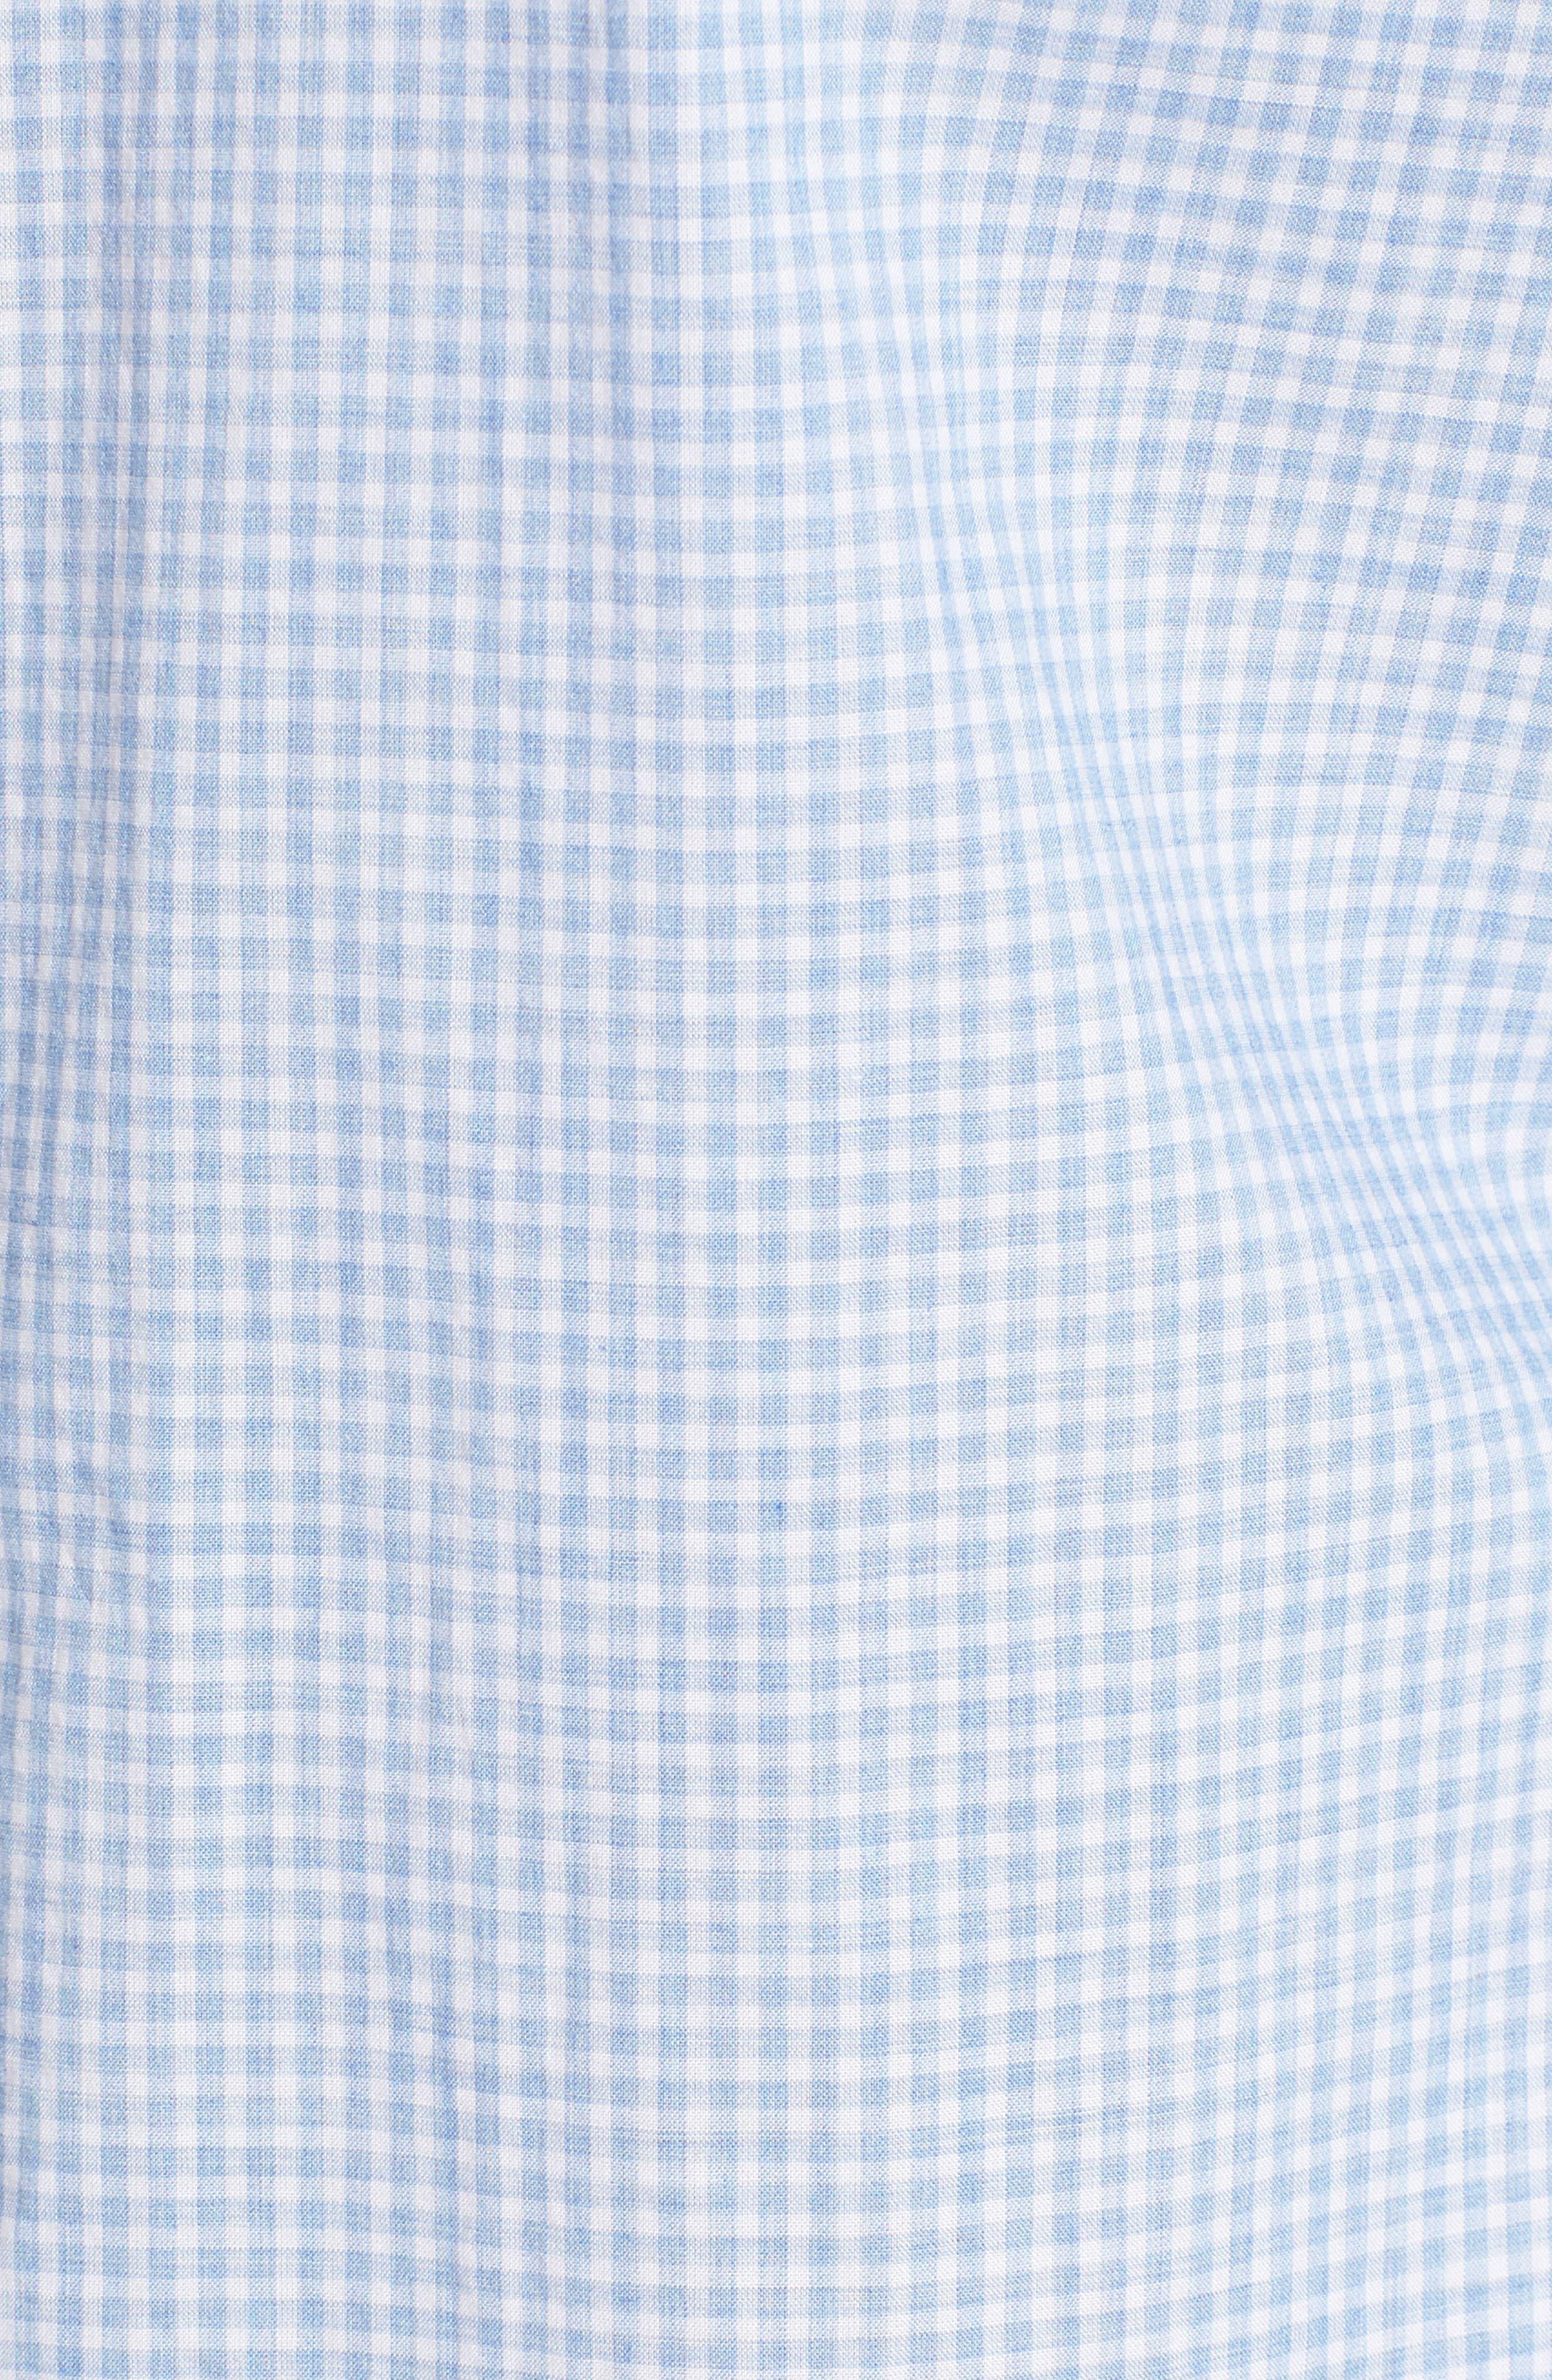 McGarry Gingham Sport Shirt,                             Alternate thumbnail 5, color,                             450